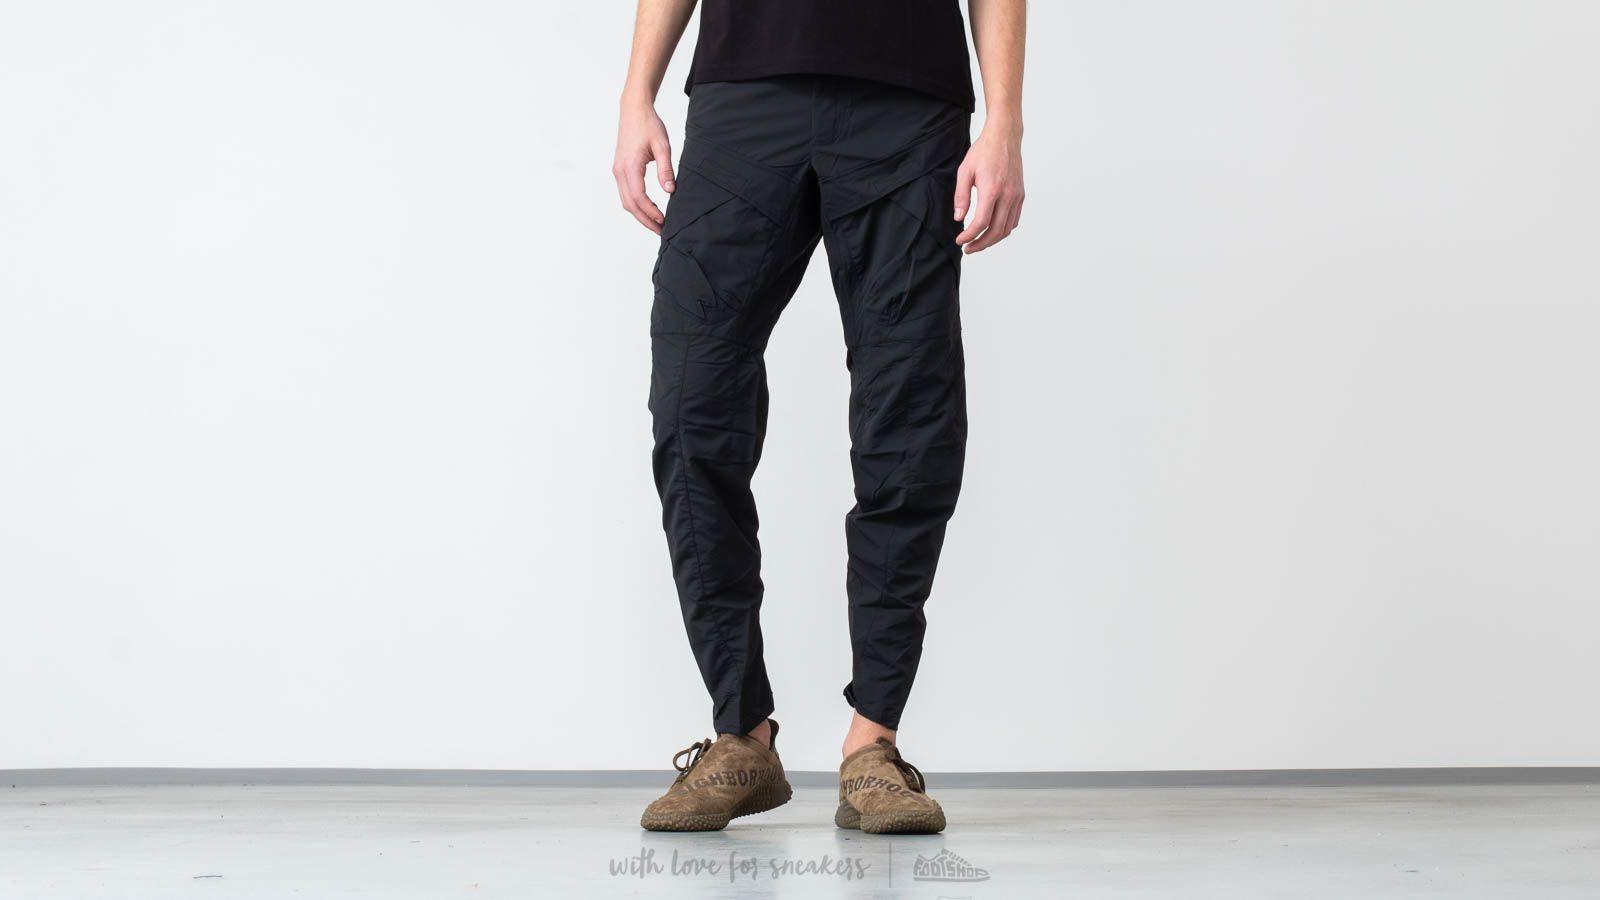 Riot Division 2 Pockets Pants Modified